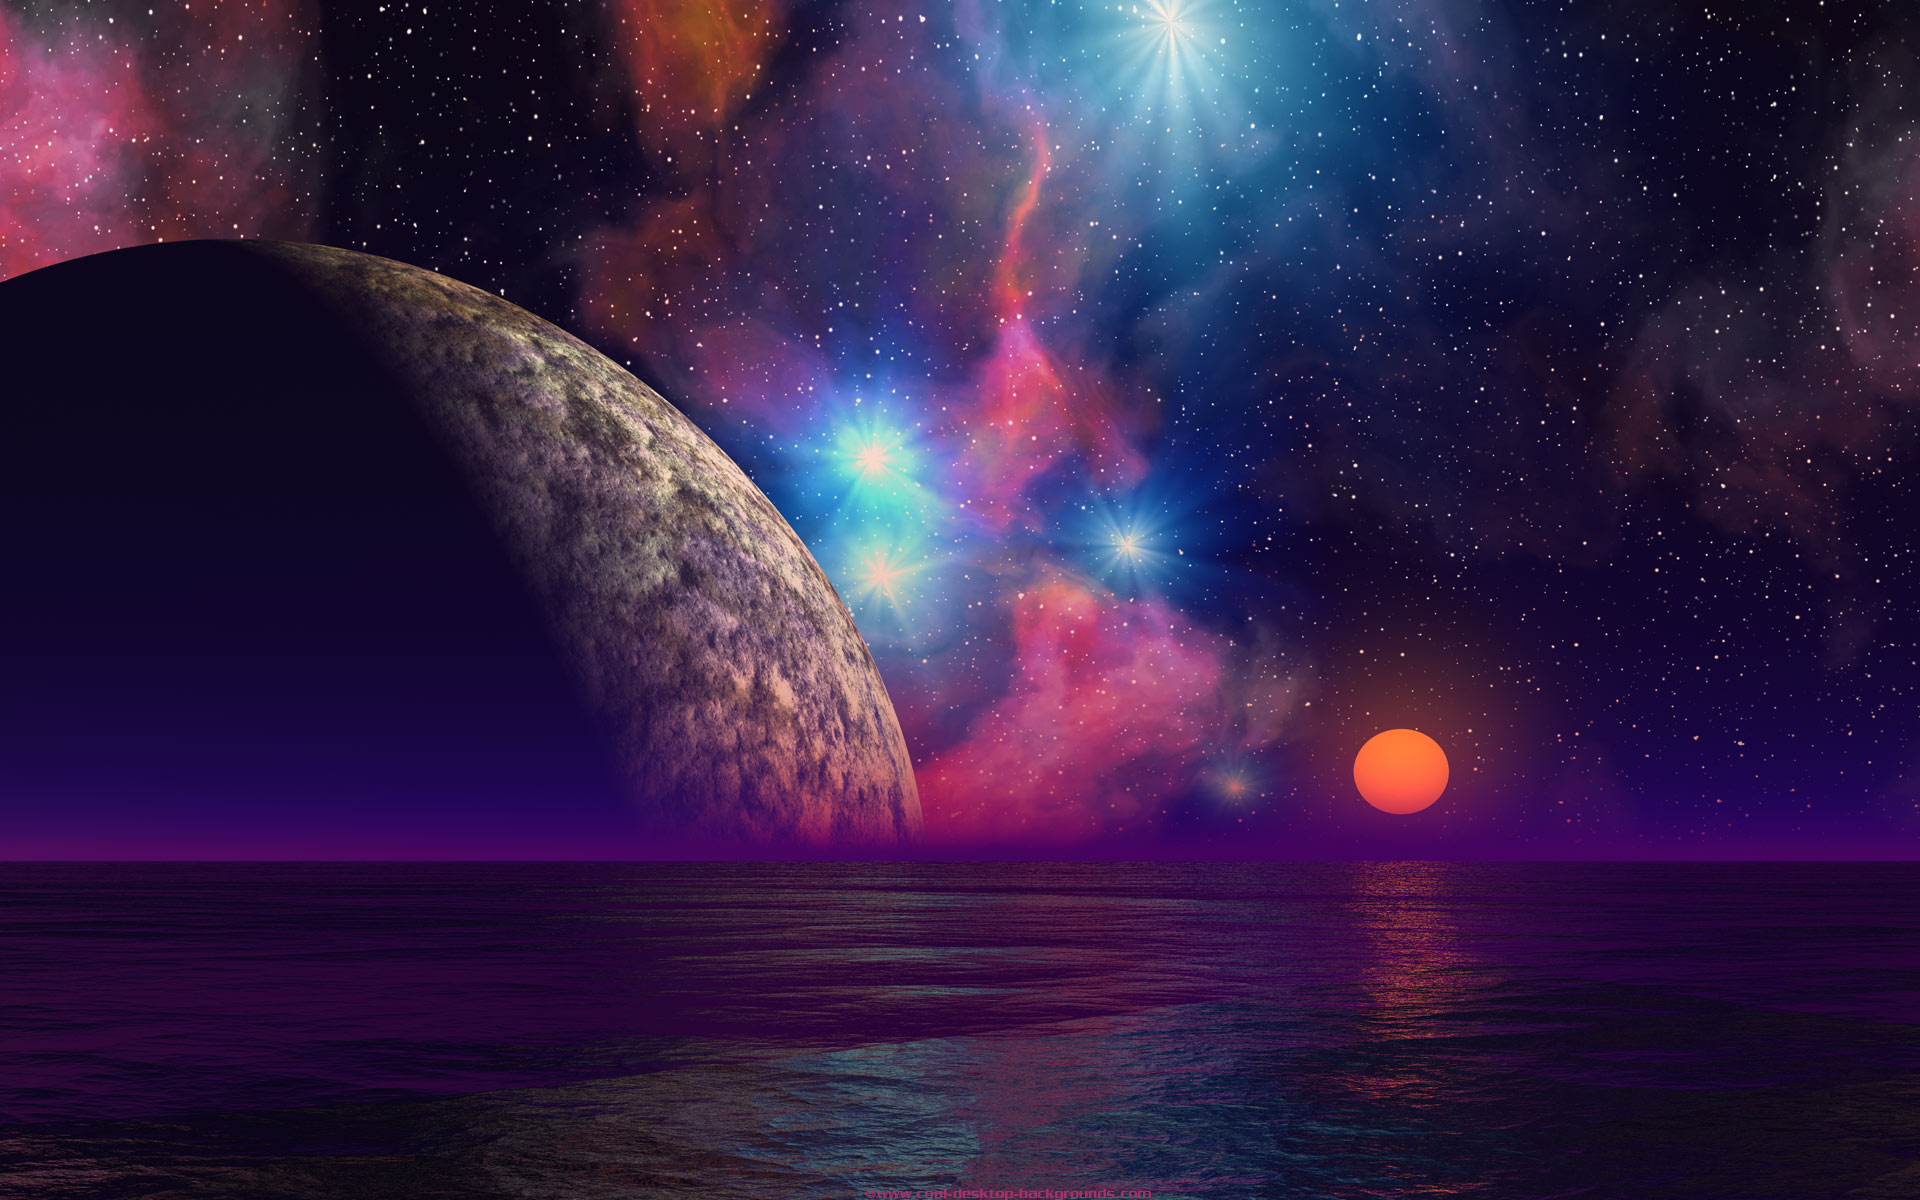 alien sunset backgrounds cool planets scifi desktop wallpaper 1920x1200